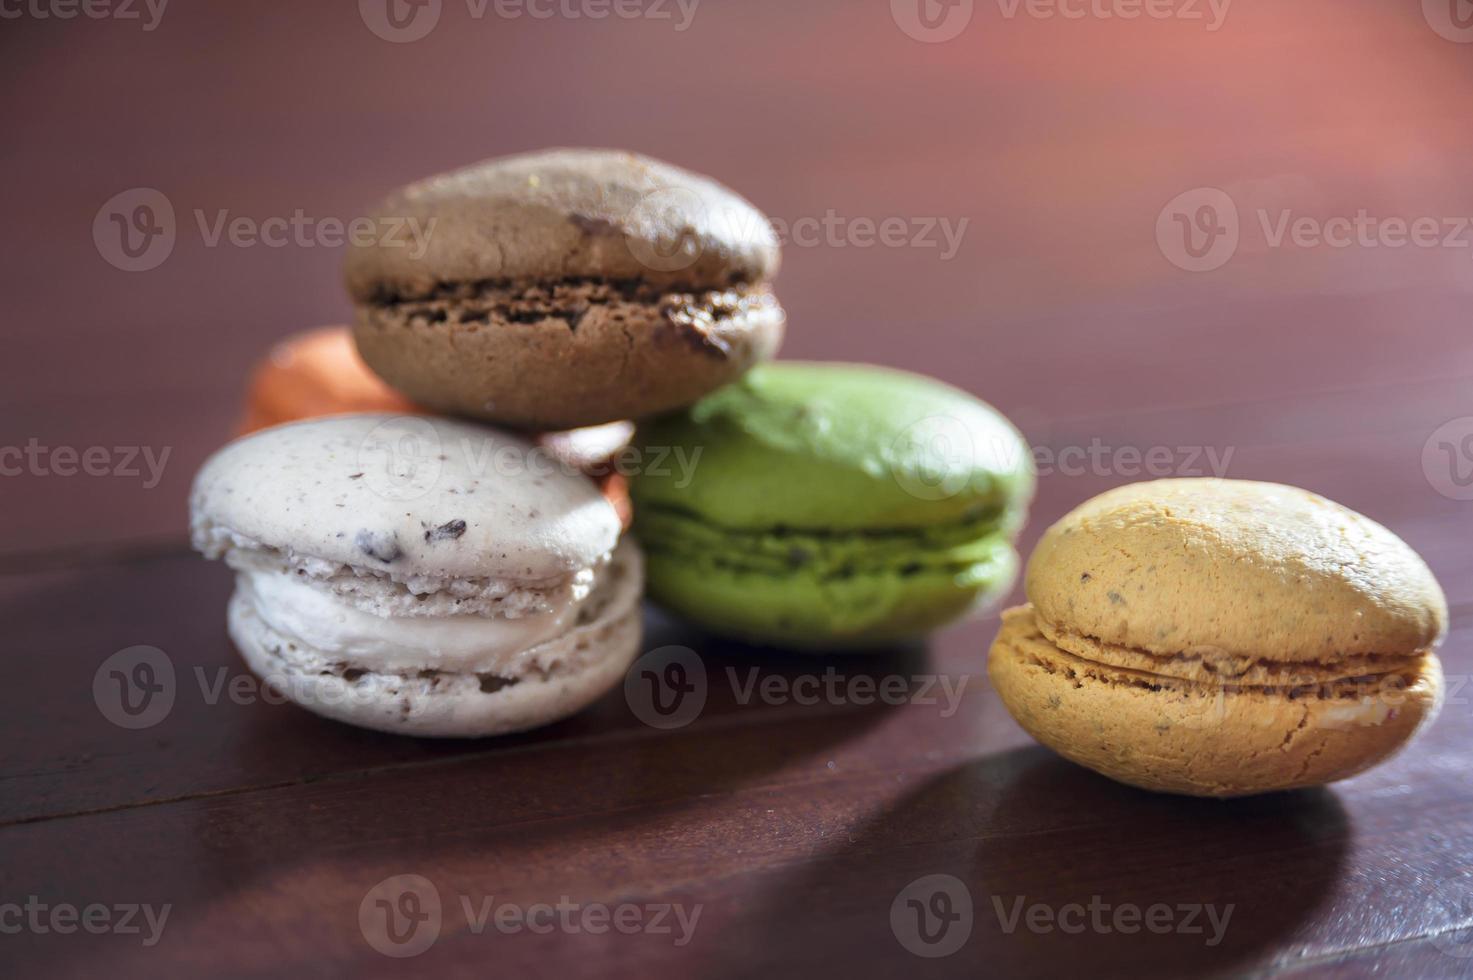 Coloridos macarons franceses en un piso de madera, merienda foto